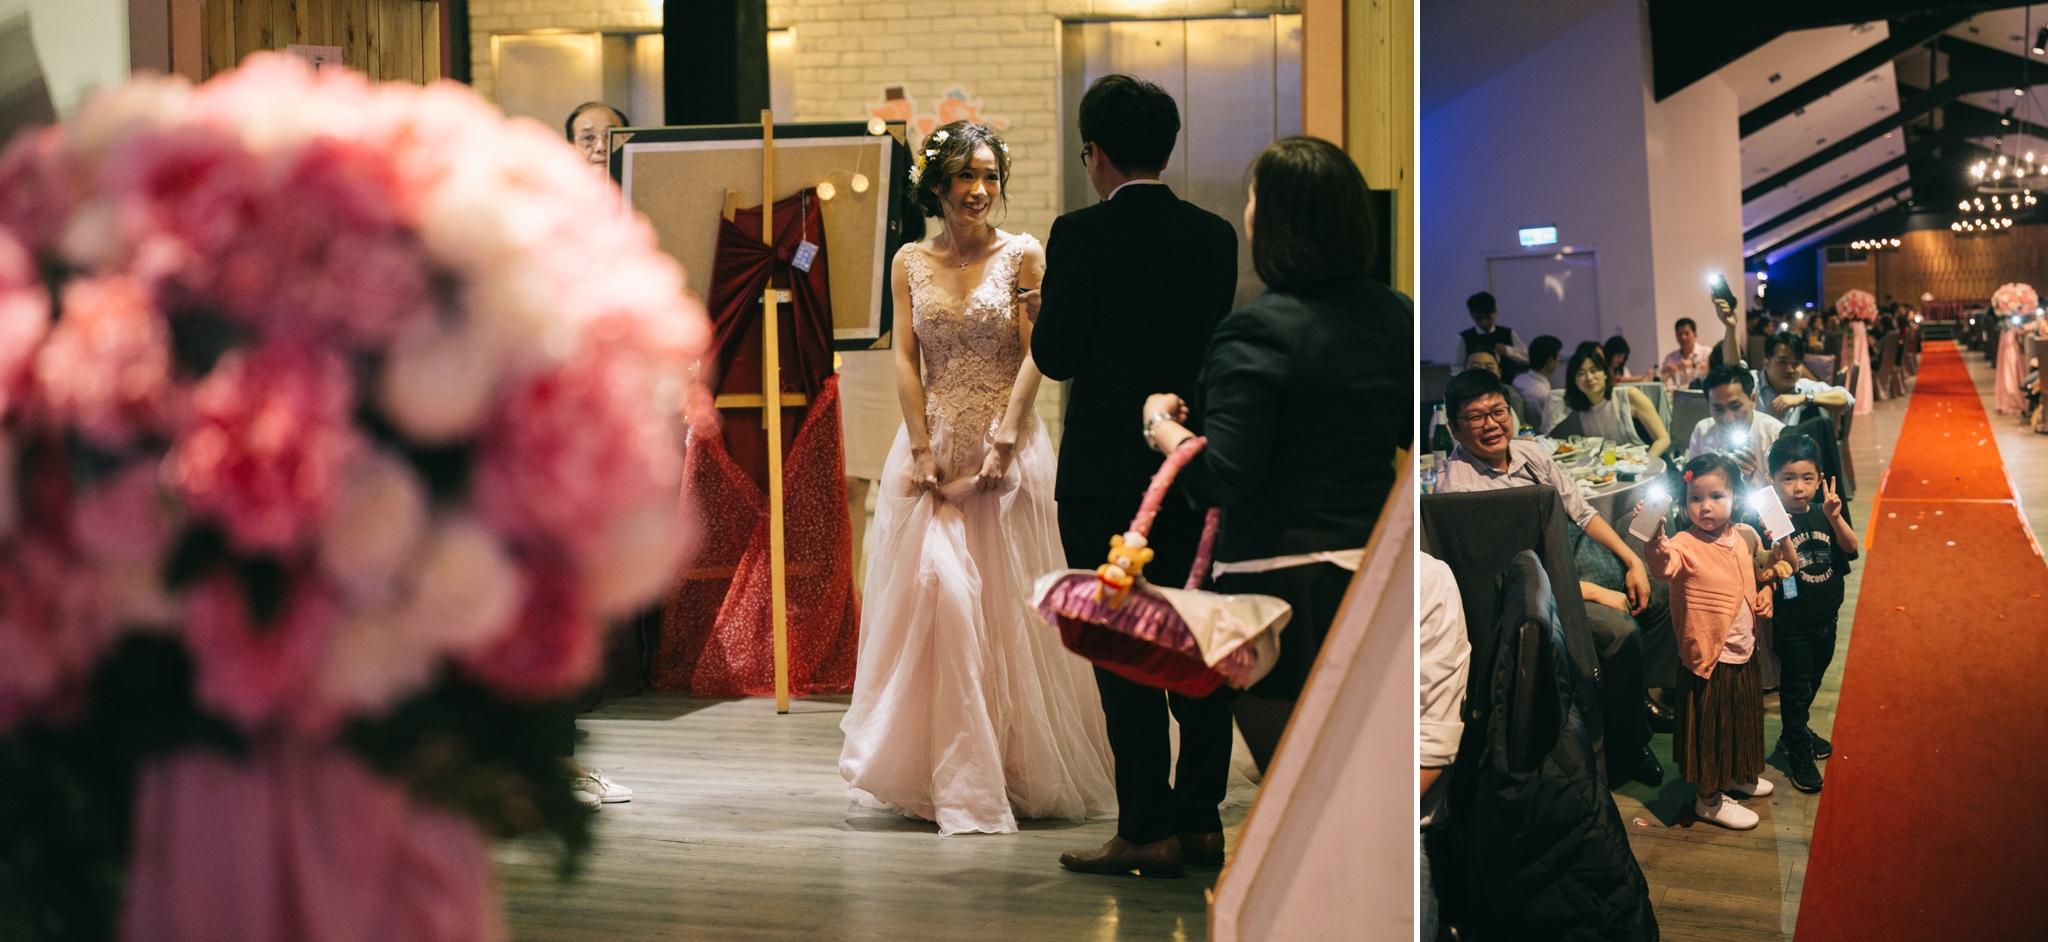 Tina+Nash-wedding-台北婚禮迎娶晚宴-新莊終身大事-134.jpg